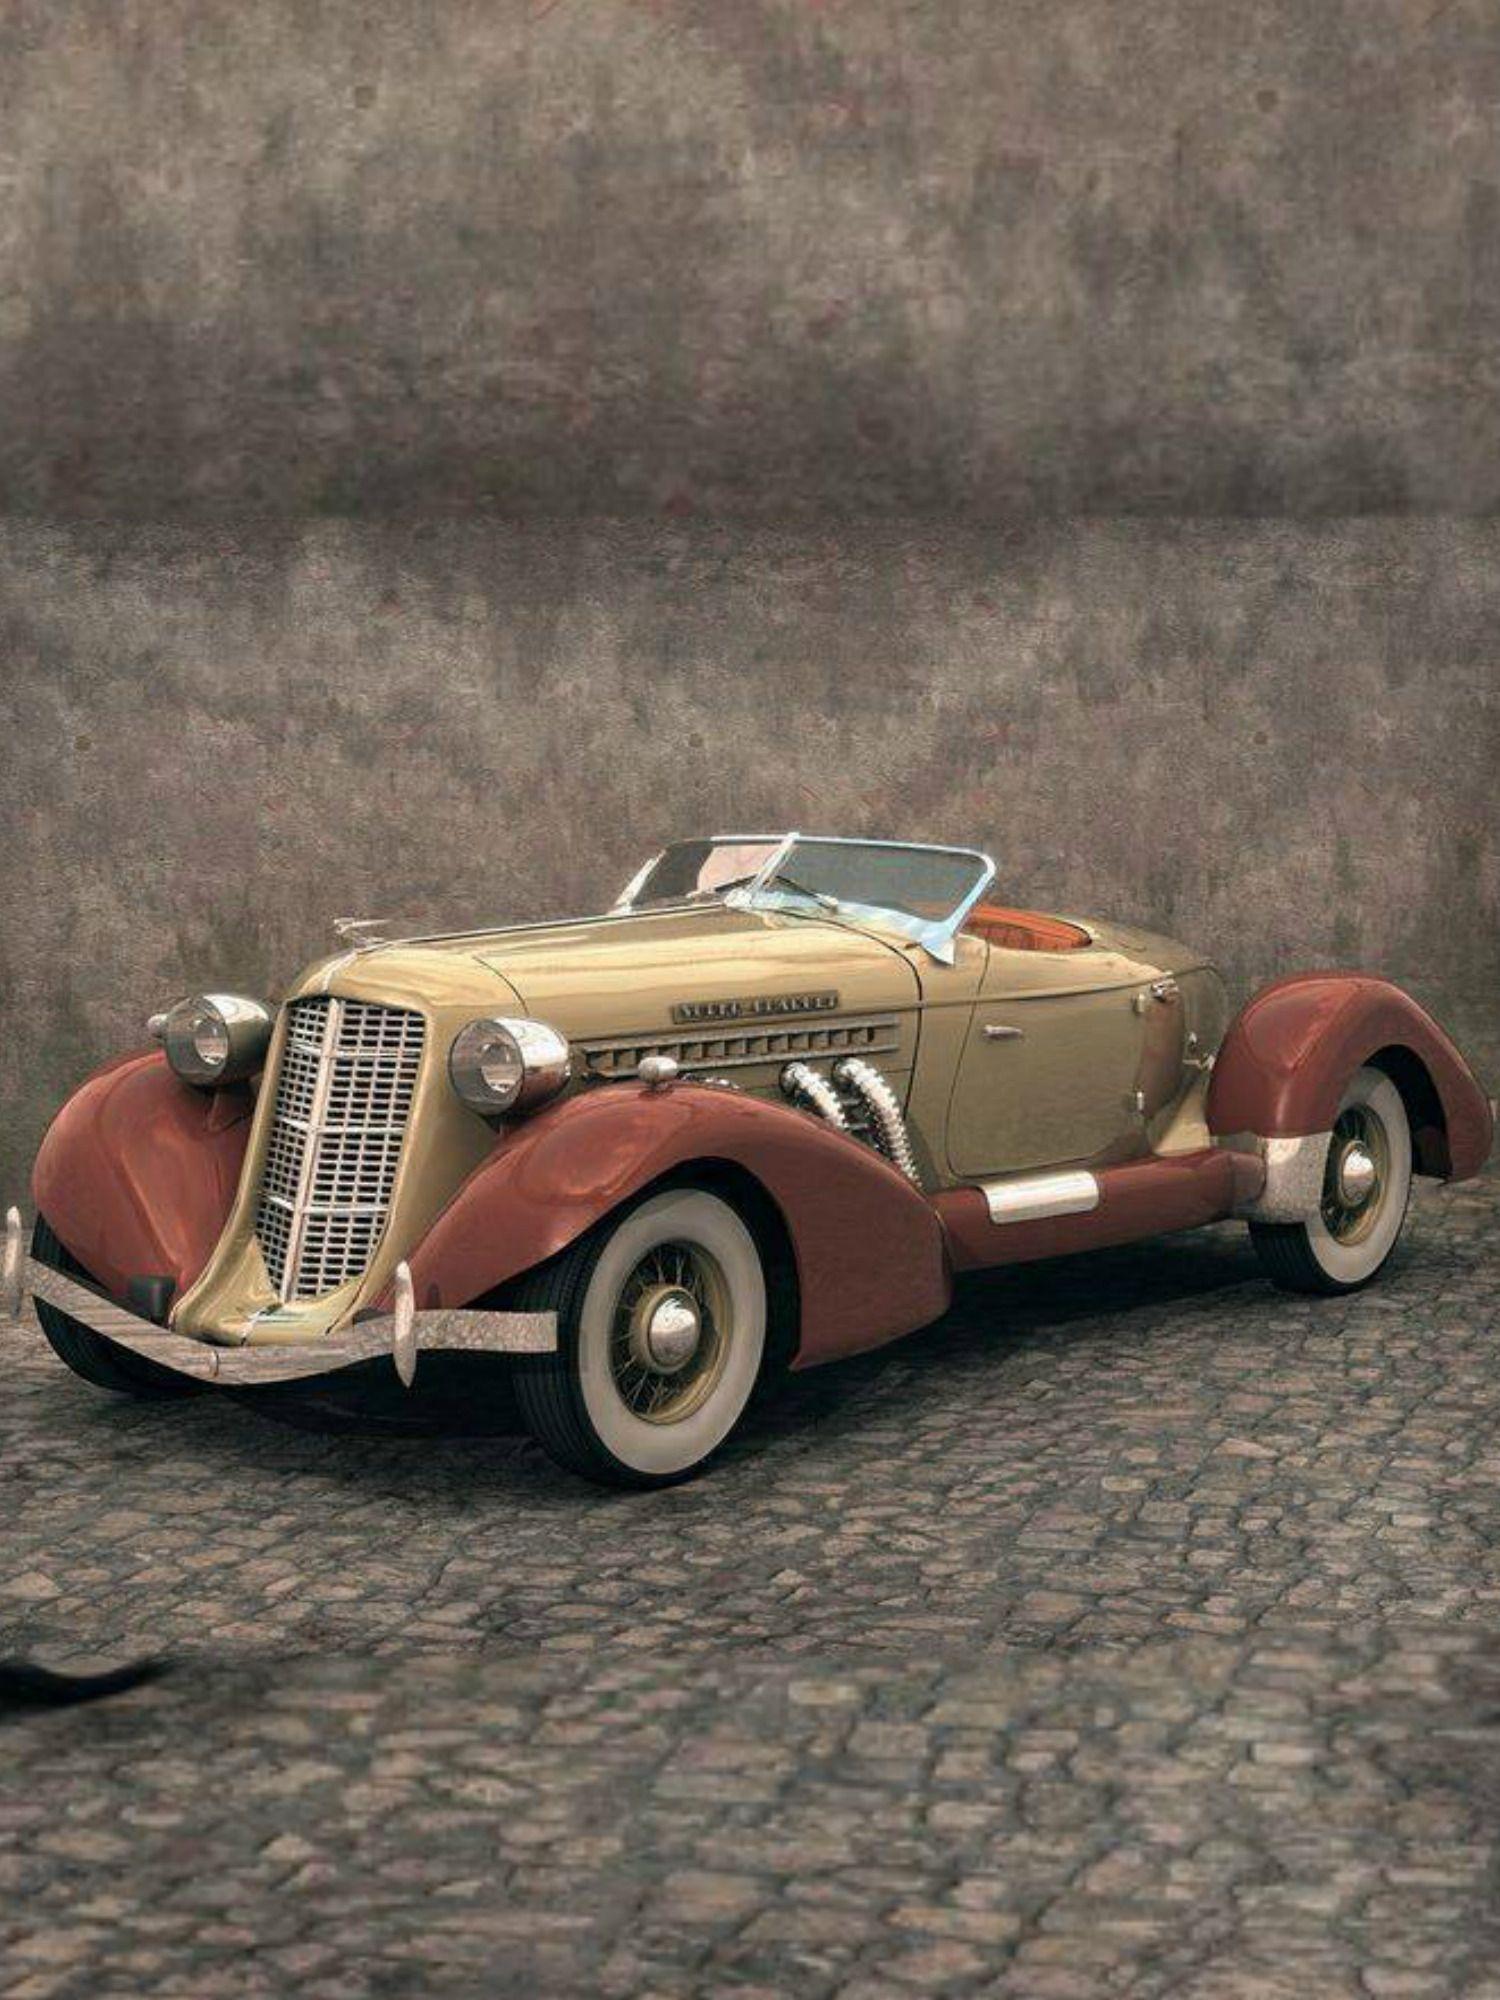 Convertible Auburn Classic Cars Pinterest Auburn - Classy classic cars